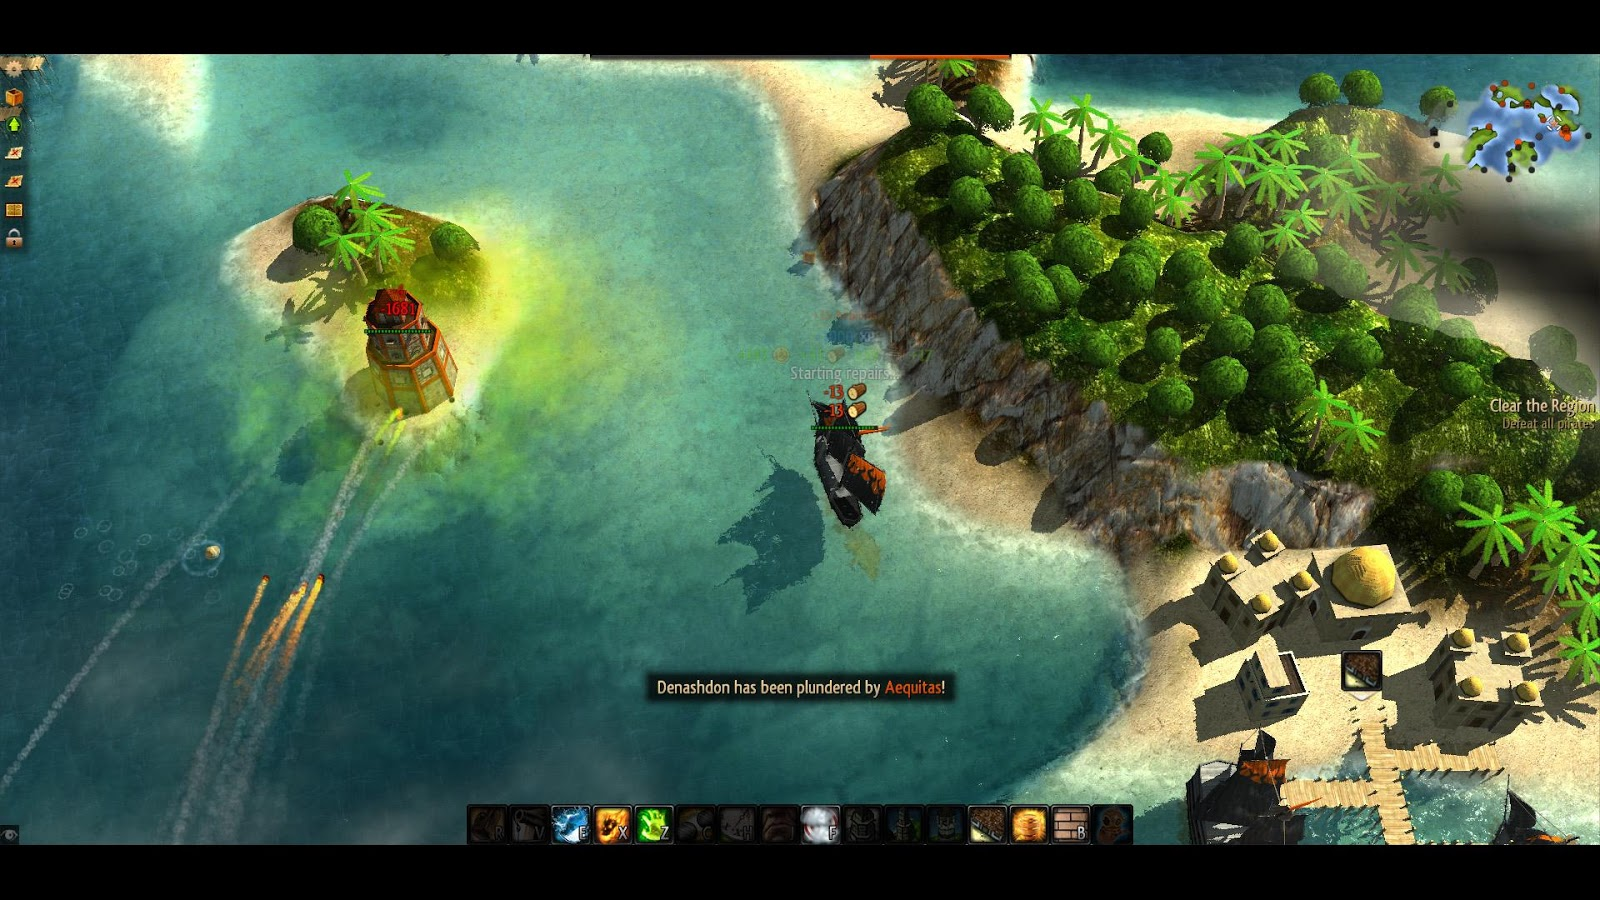 Free Download Windward, Gratis Android Game